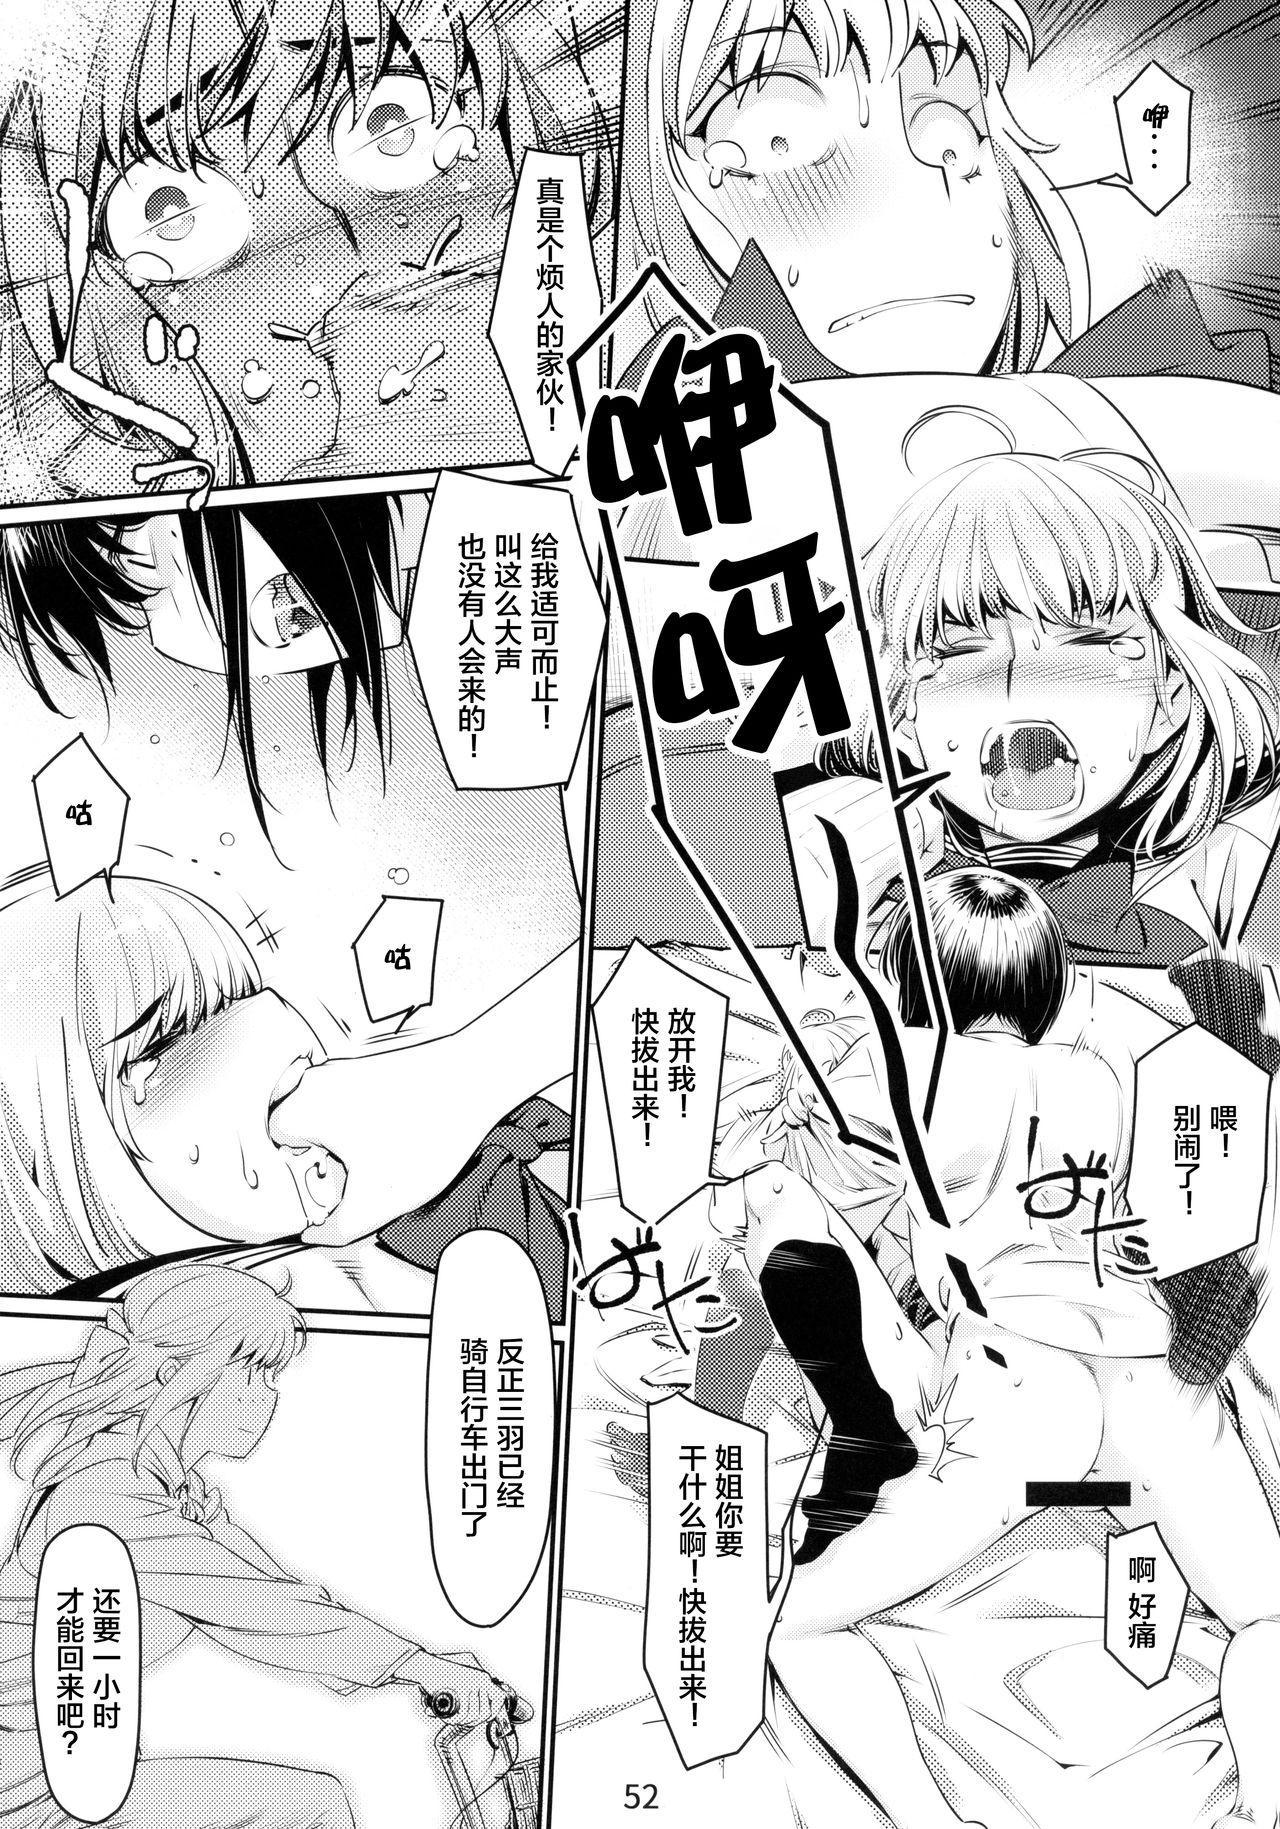 Otonano Omochiya 6 Kan 51